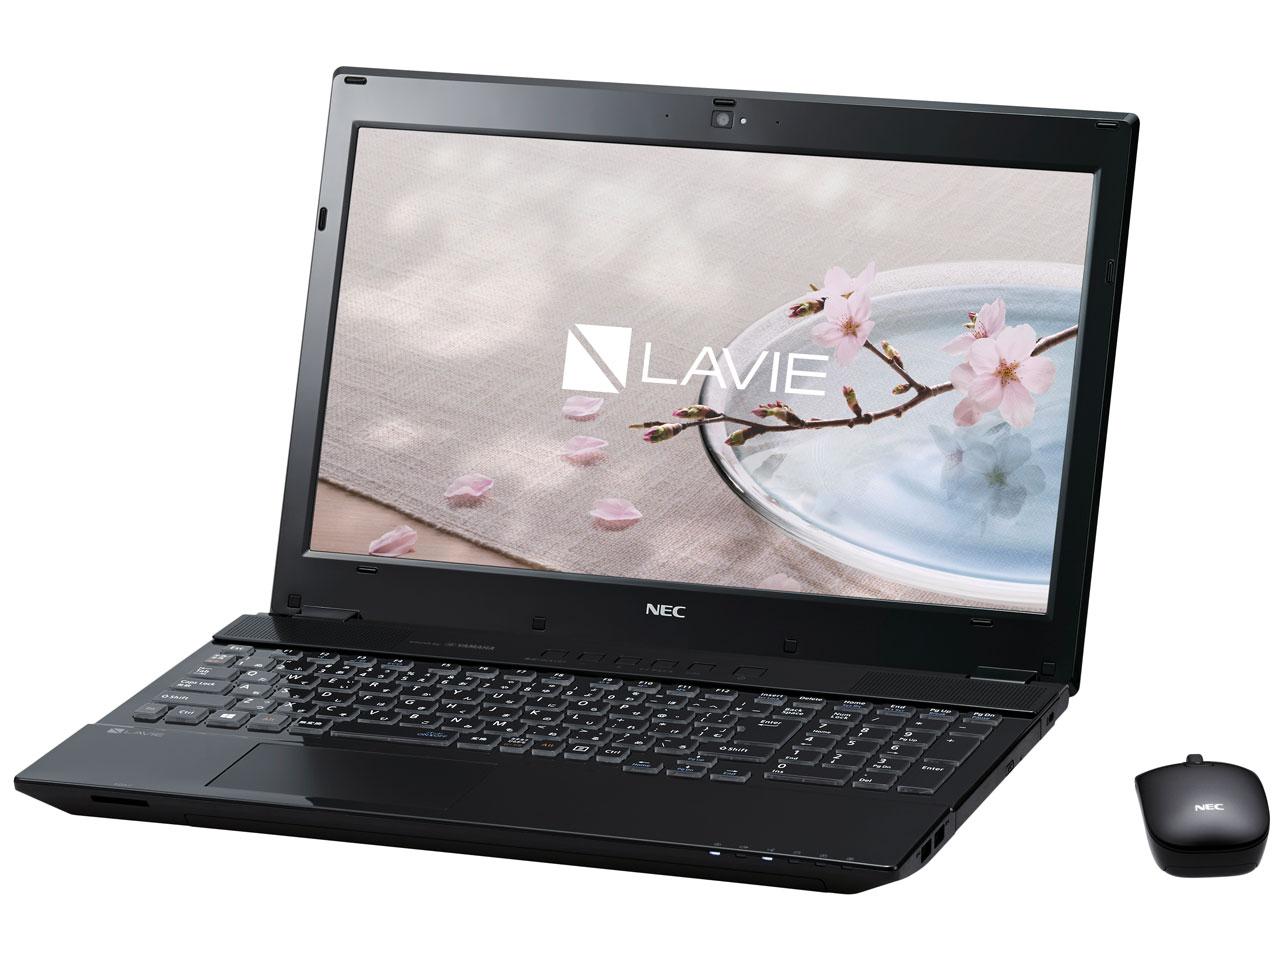 NEC LAVIE Note Standard NS750